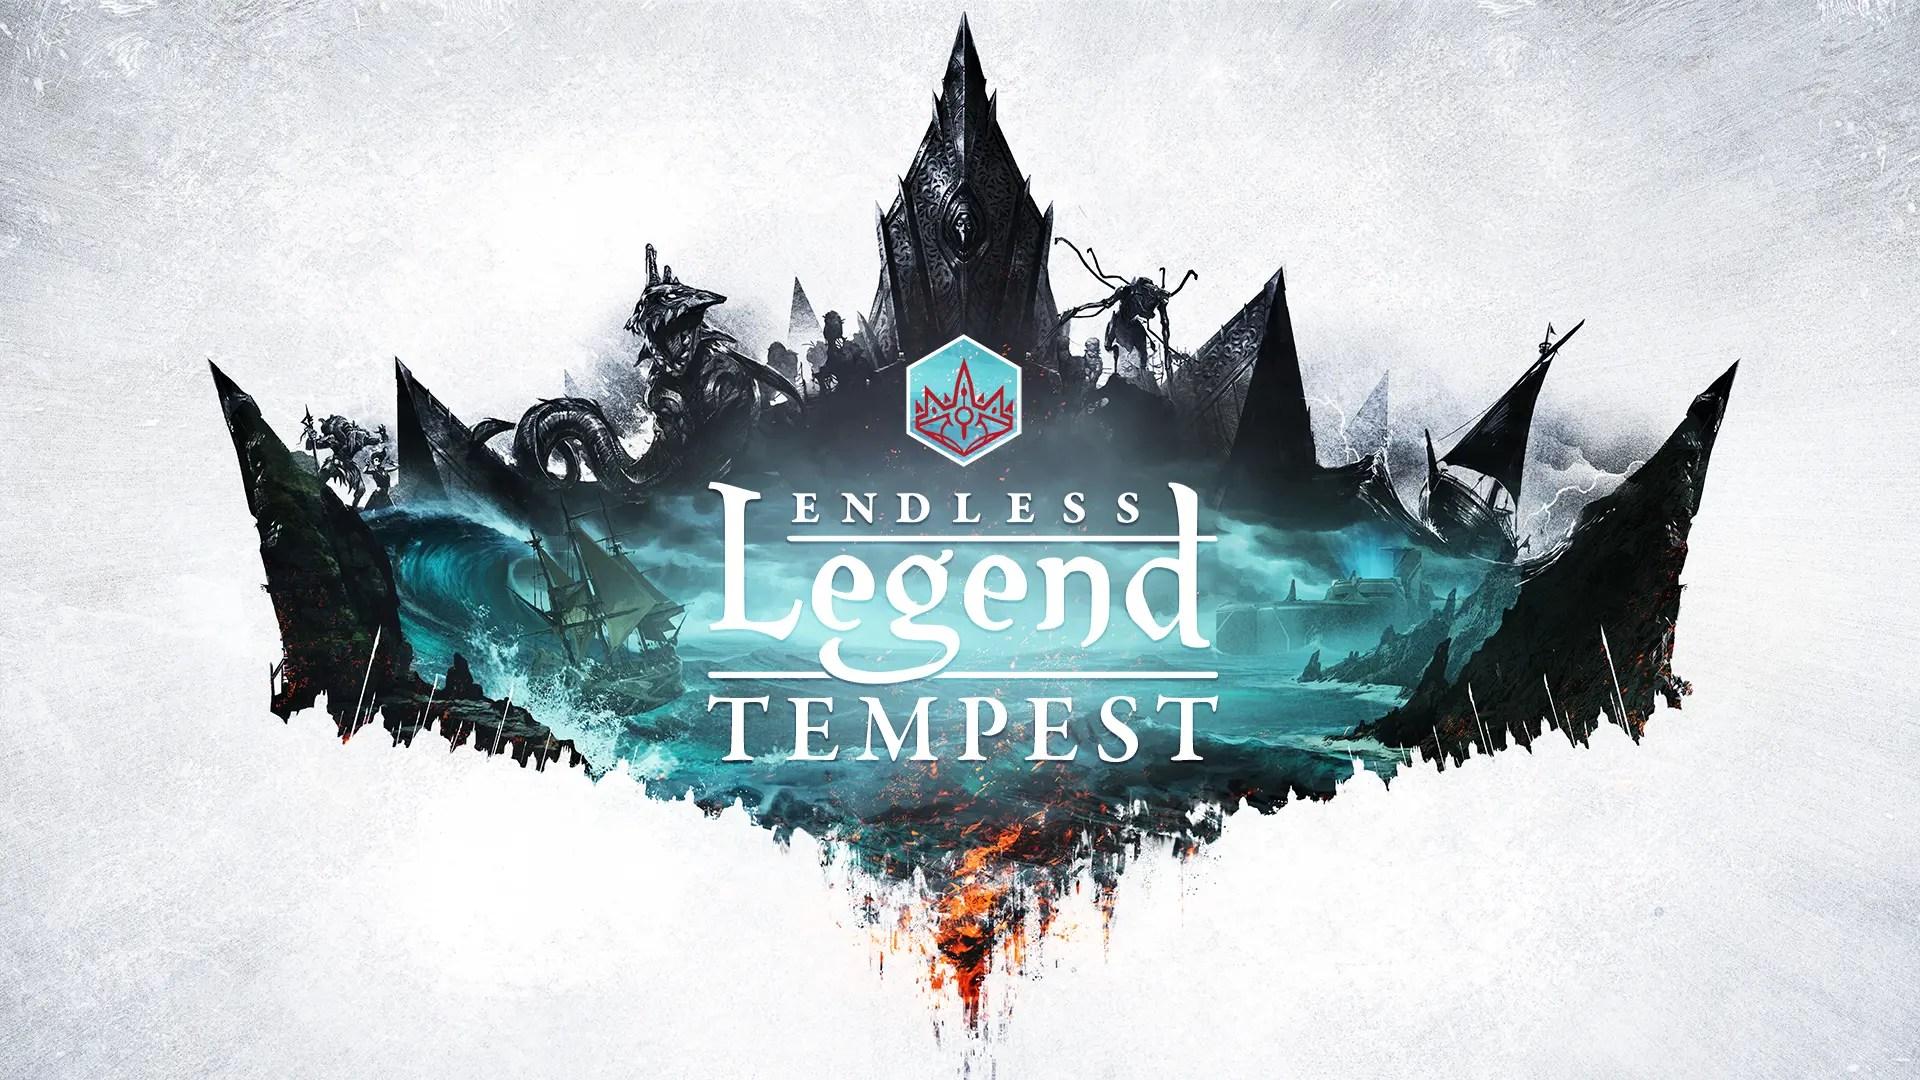 EL_TEMPEST_KEYART_LOGO